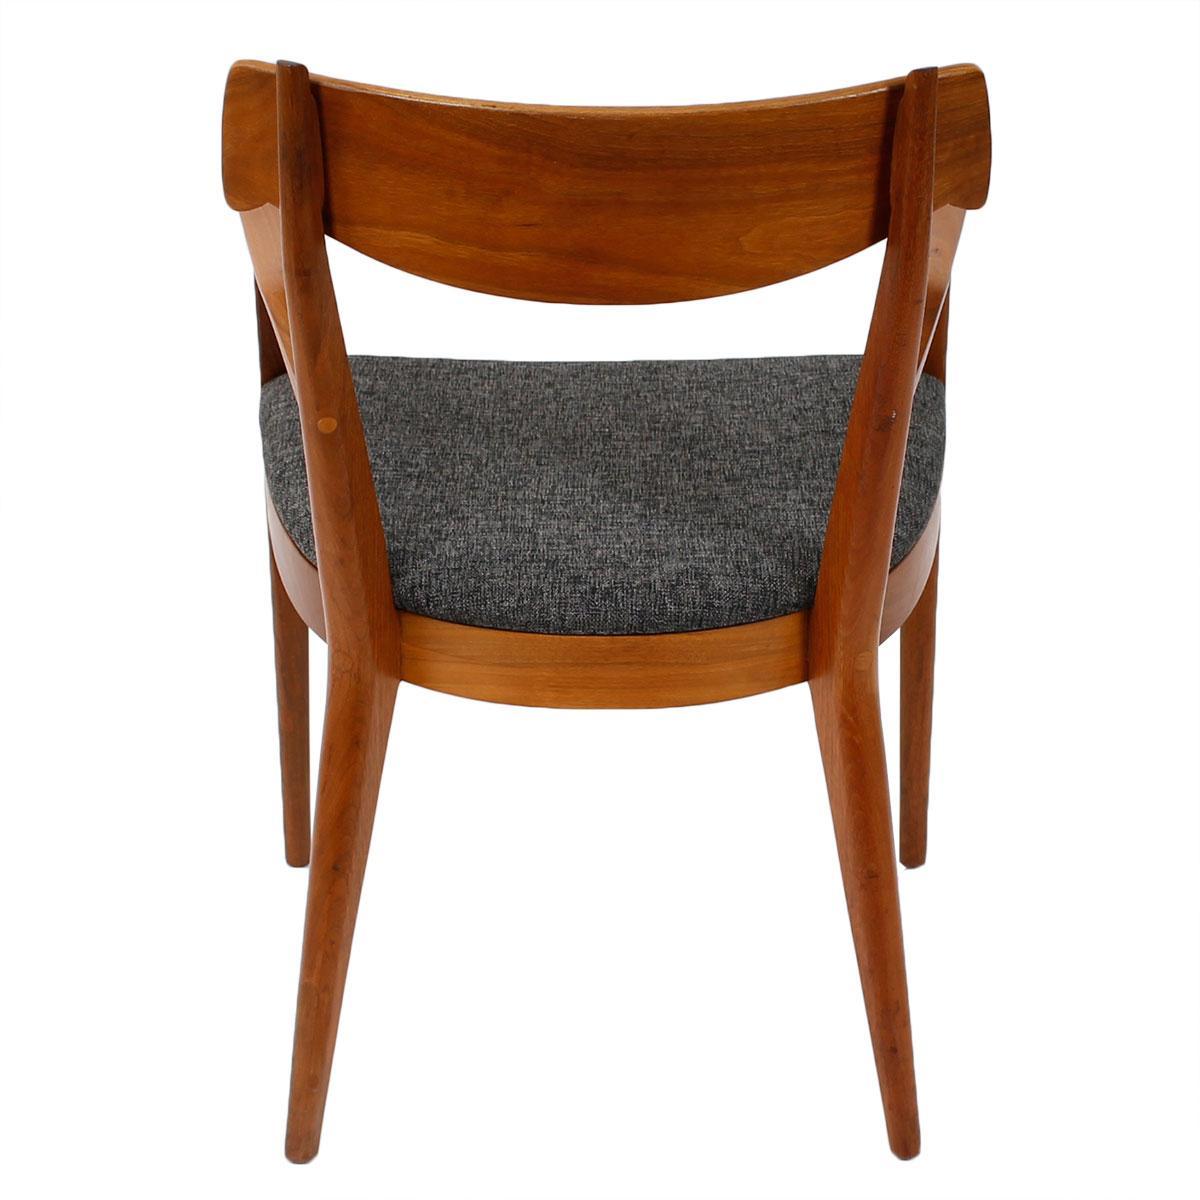 MCM Drexel Walnut Dining Arm Chairs Pair Chairish : 91b303c9 a044 42d0 8cda 666e000353beaspectfitampwidth640ampheight640 from www.chairish.com size 640 x 640 jpeg 37kB